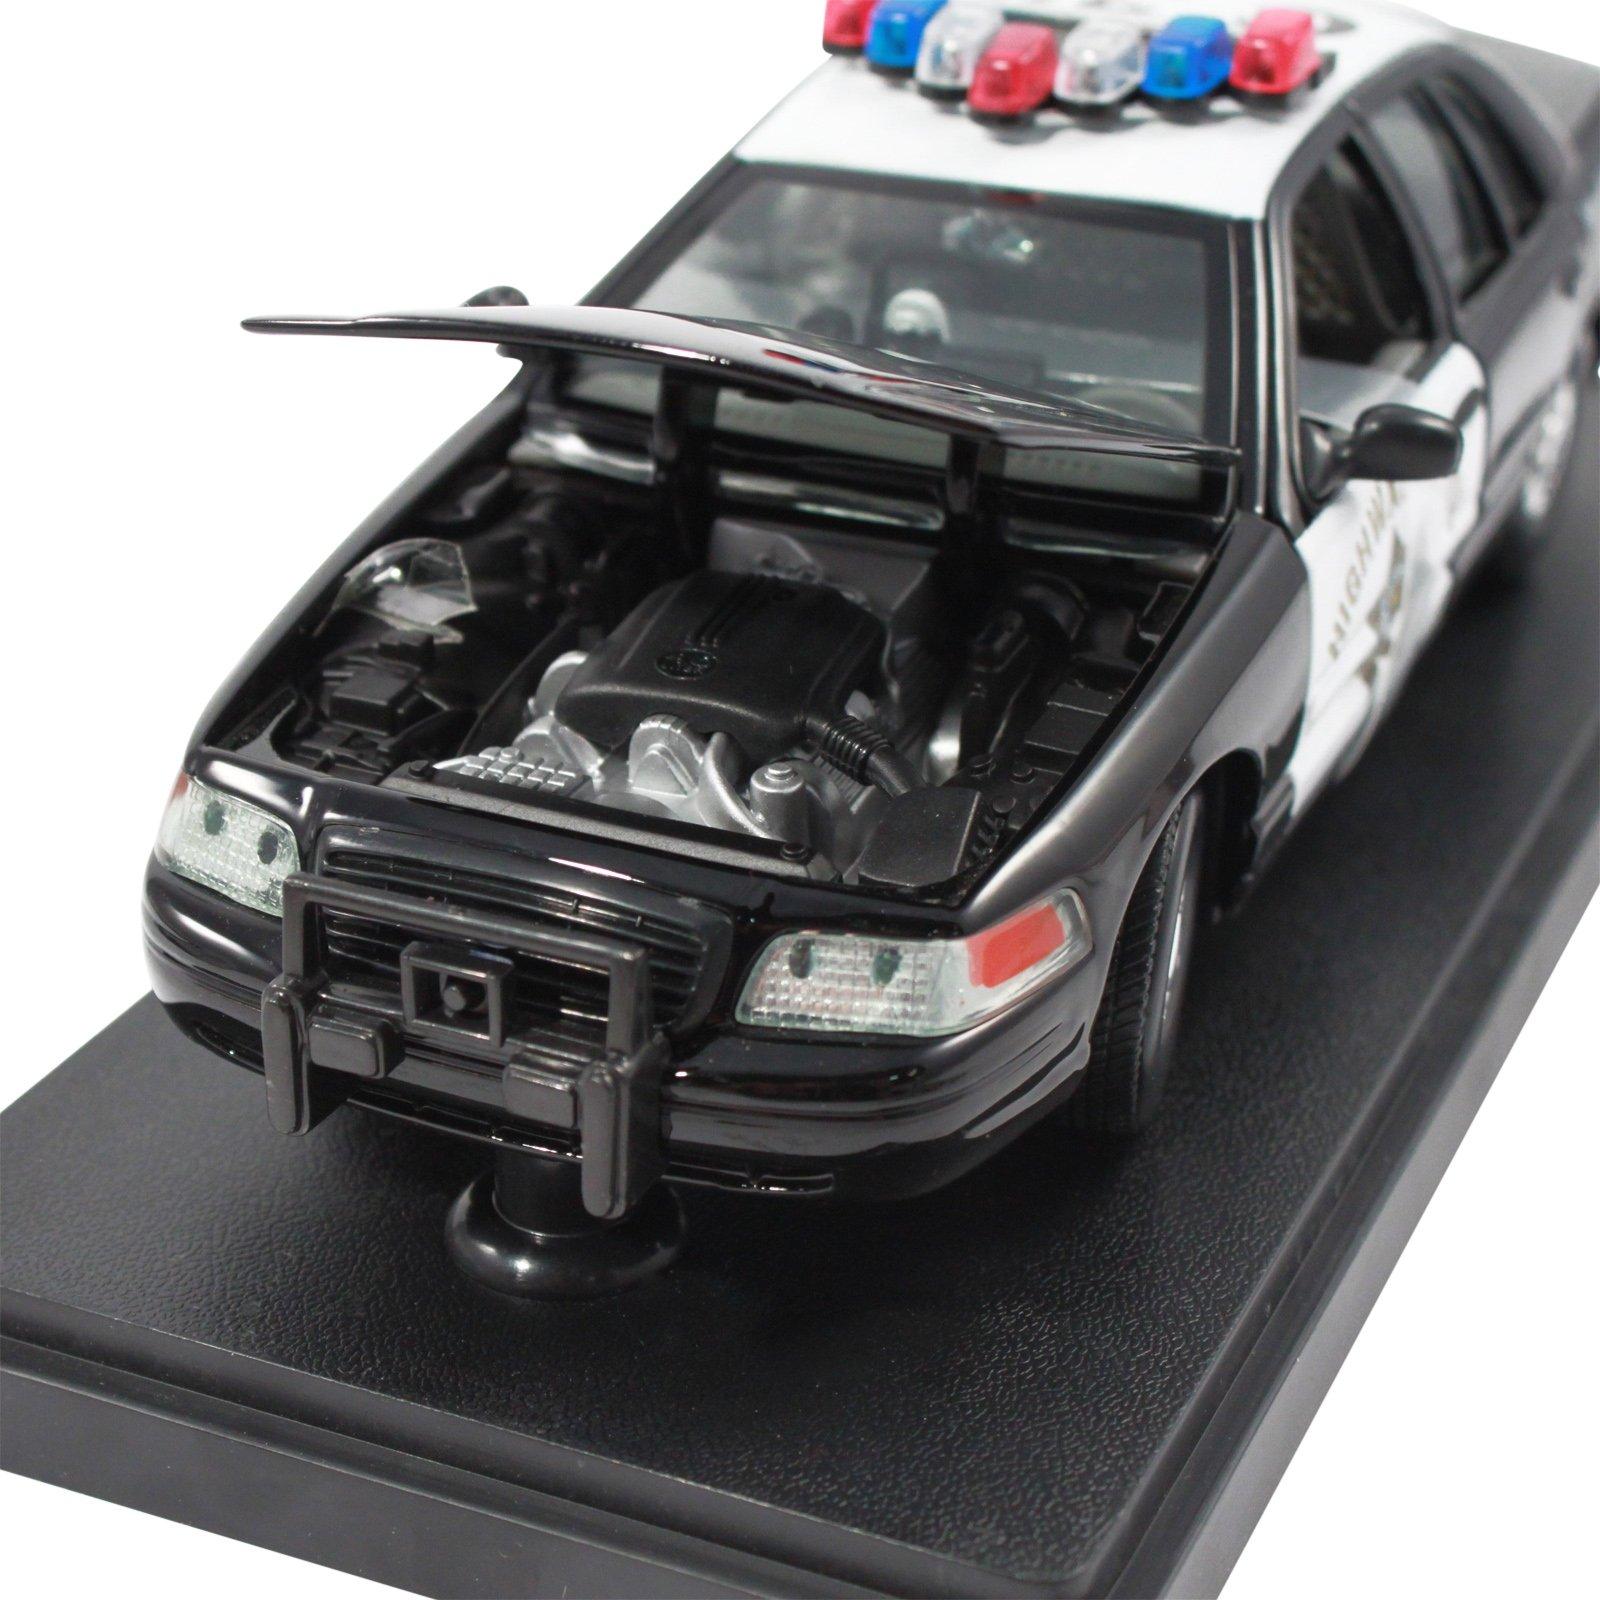 Collectible California Highway Patrol Police Car Replica 1:24 Scale Diecast